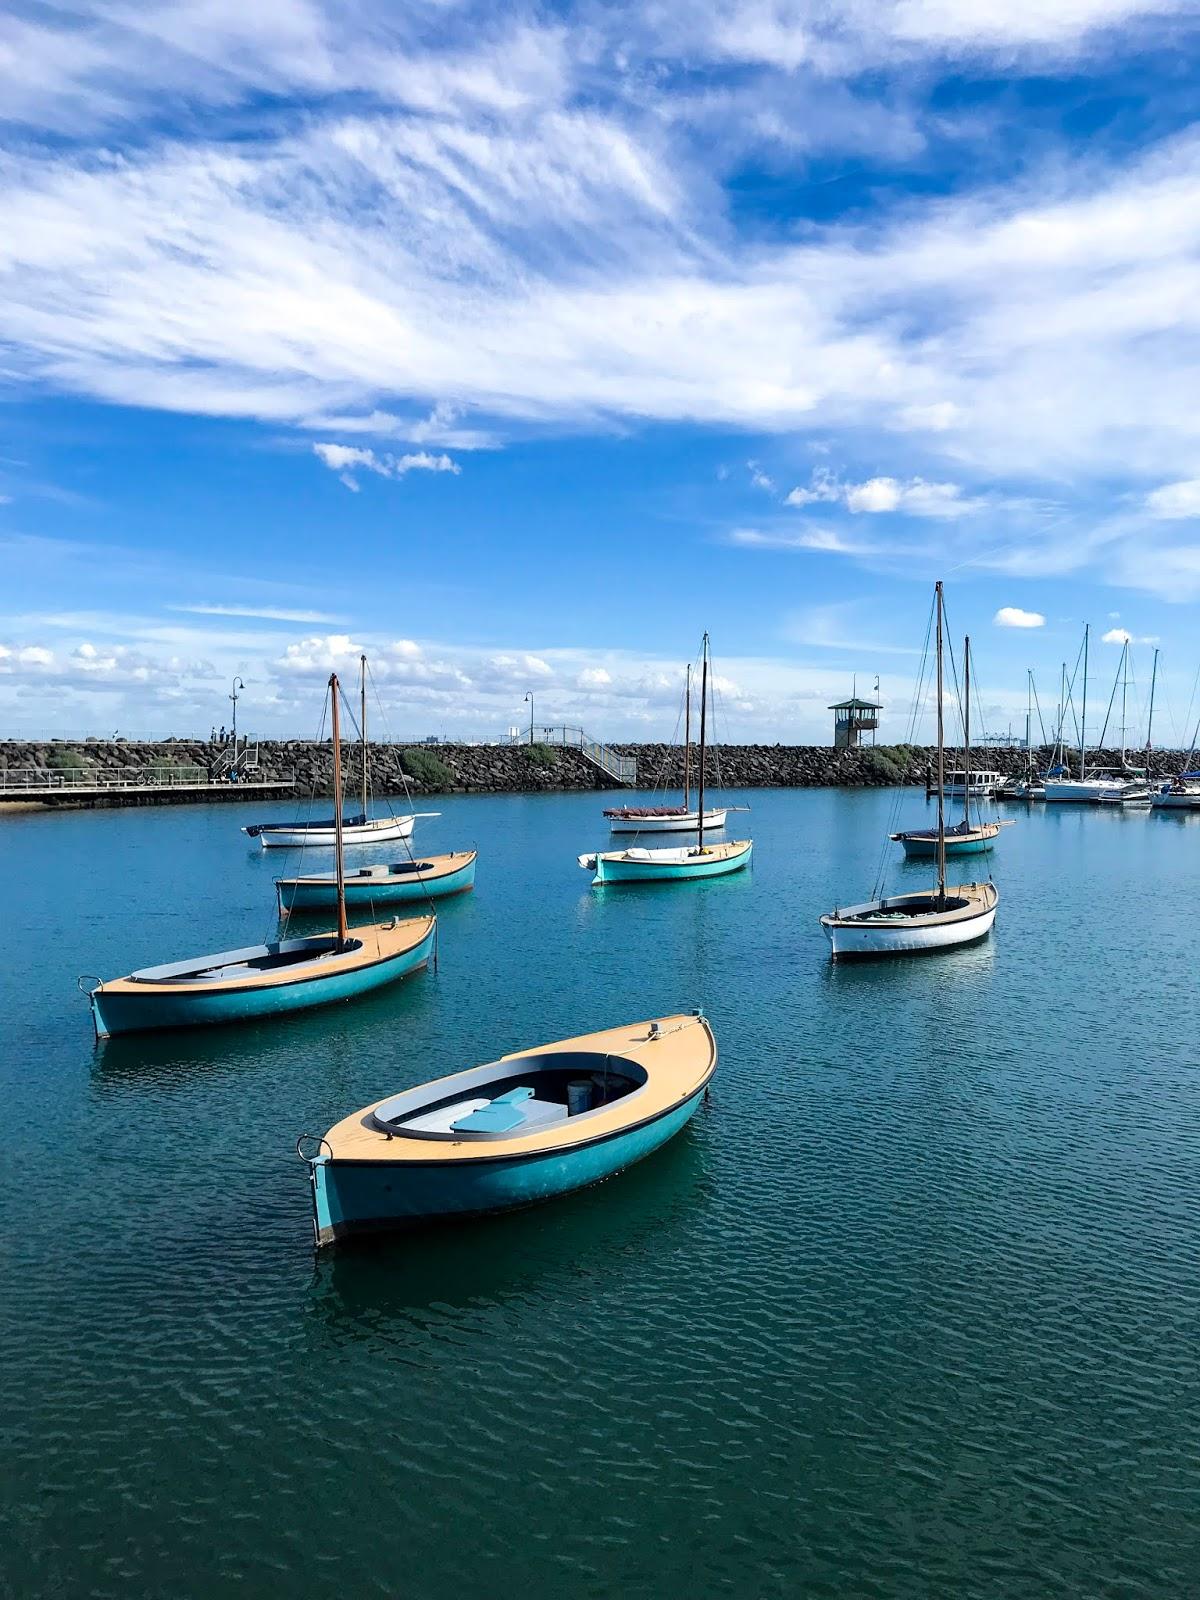 Boats on Water at St Kilda